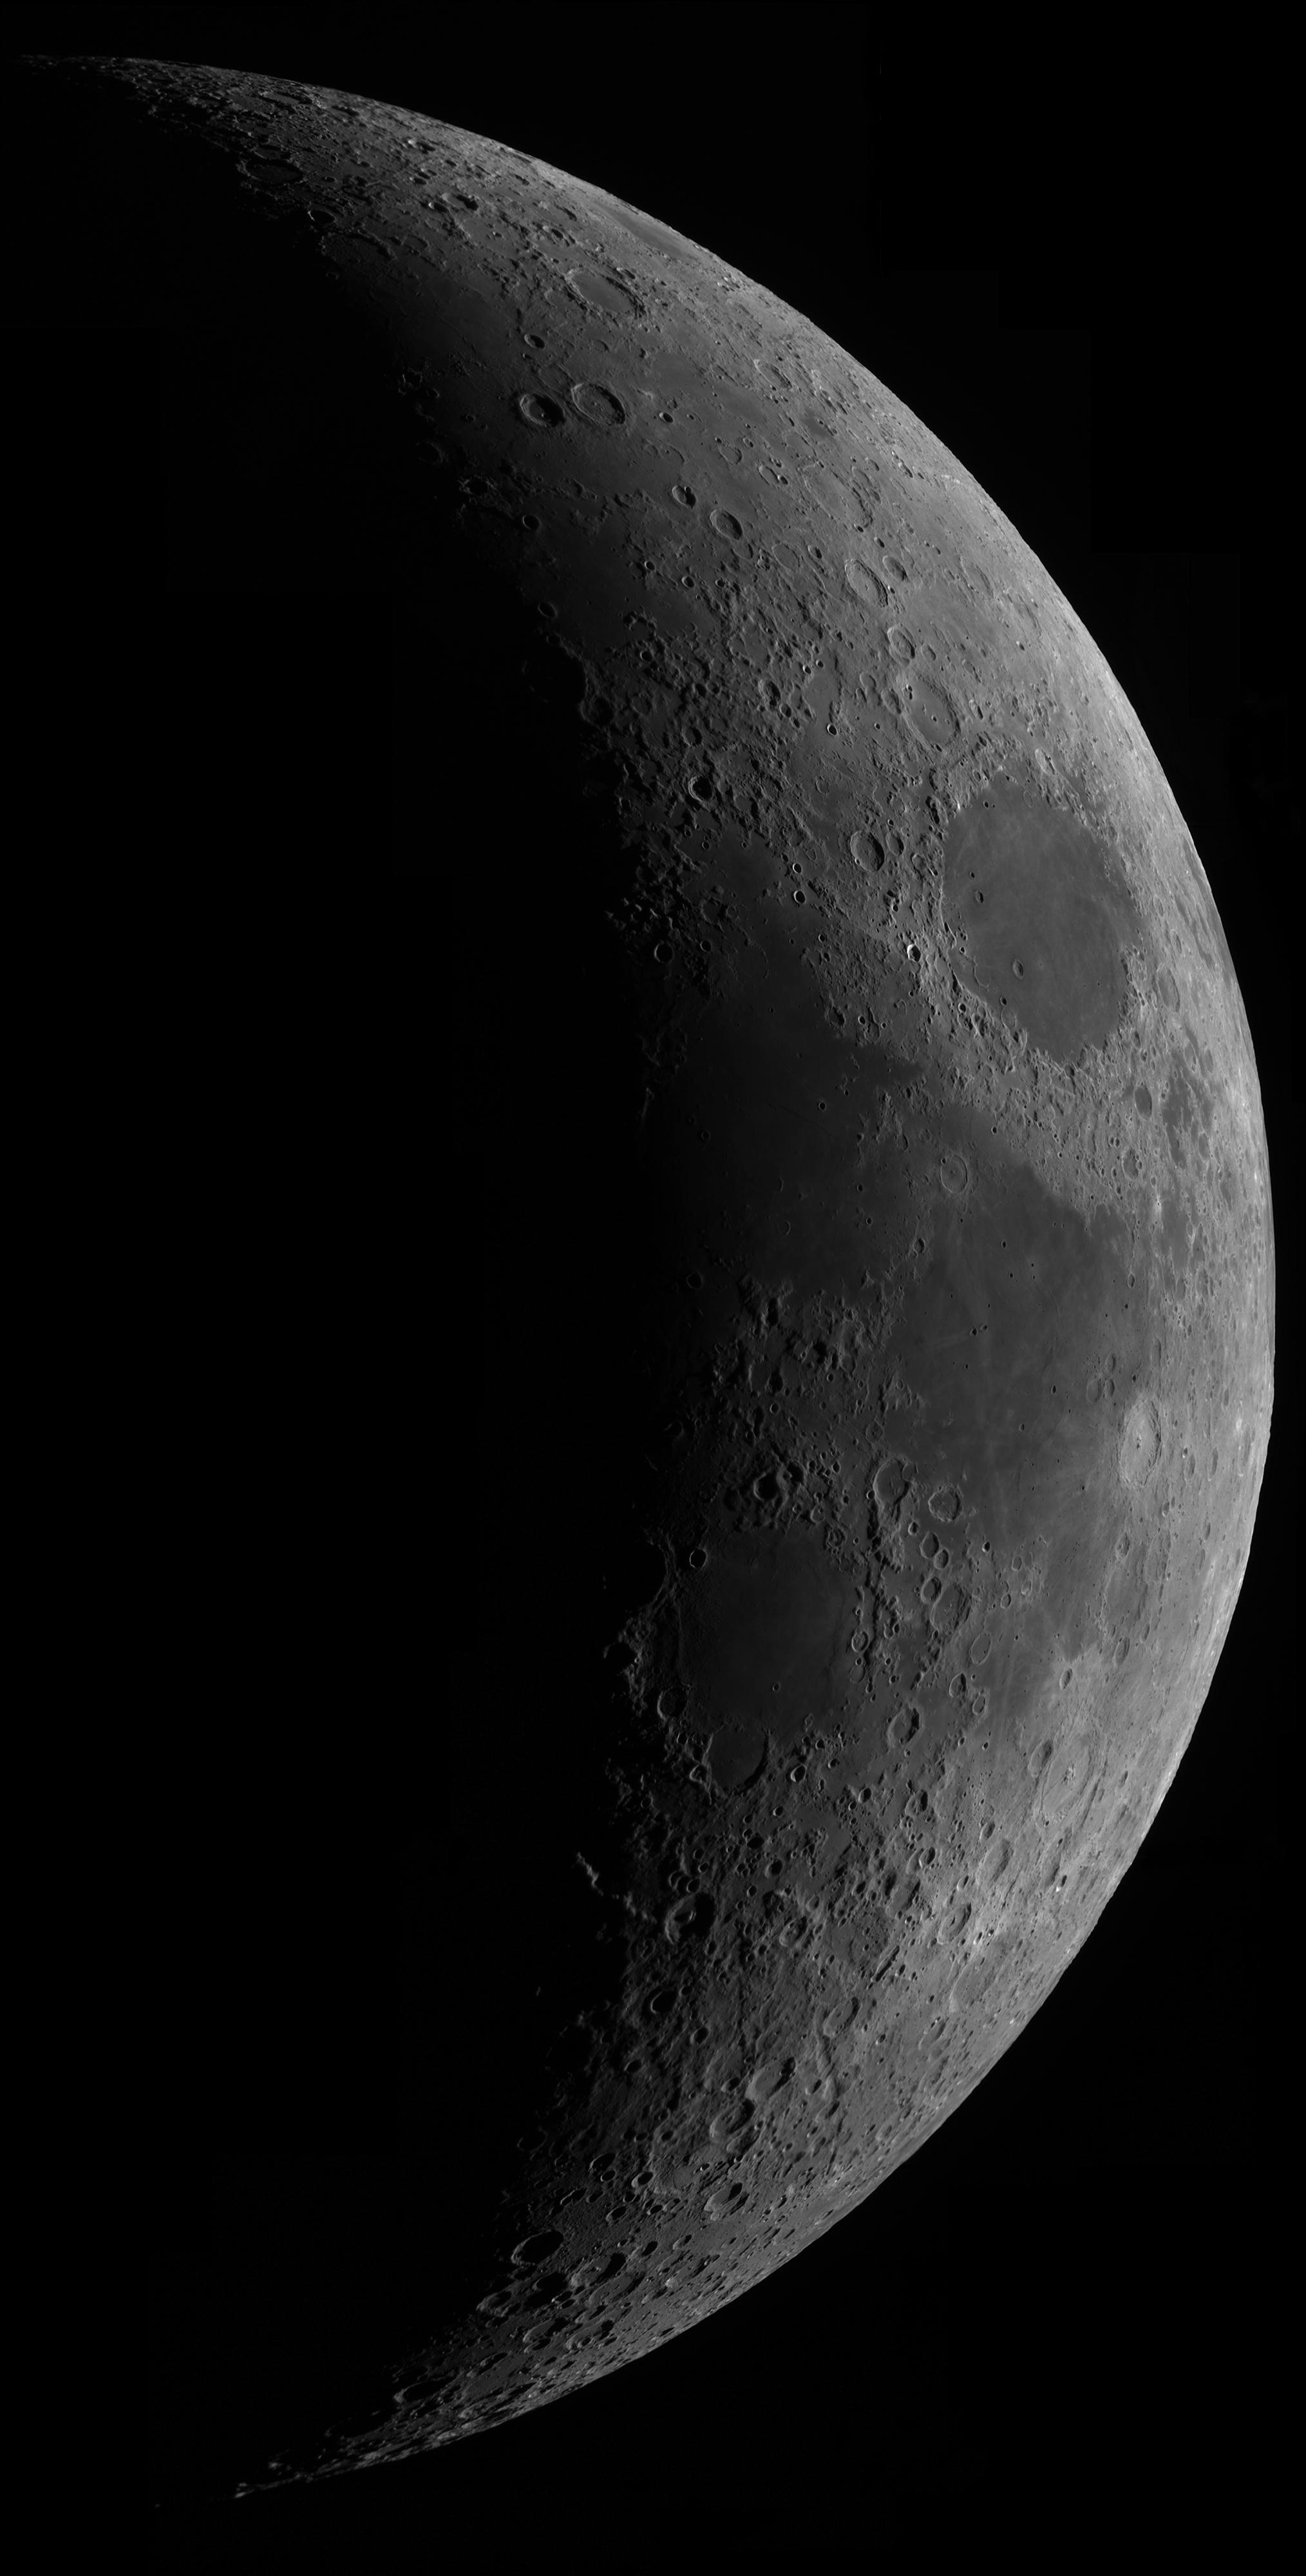 Mosaique lunaire C11 asi 178MM filtre vert 2018-04-20-(10)_stitch.jpg